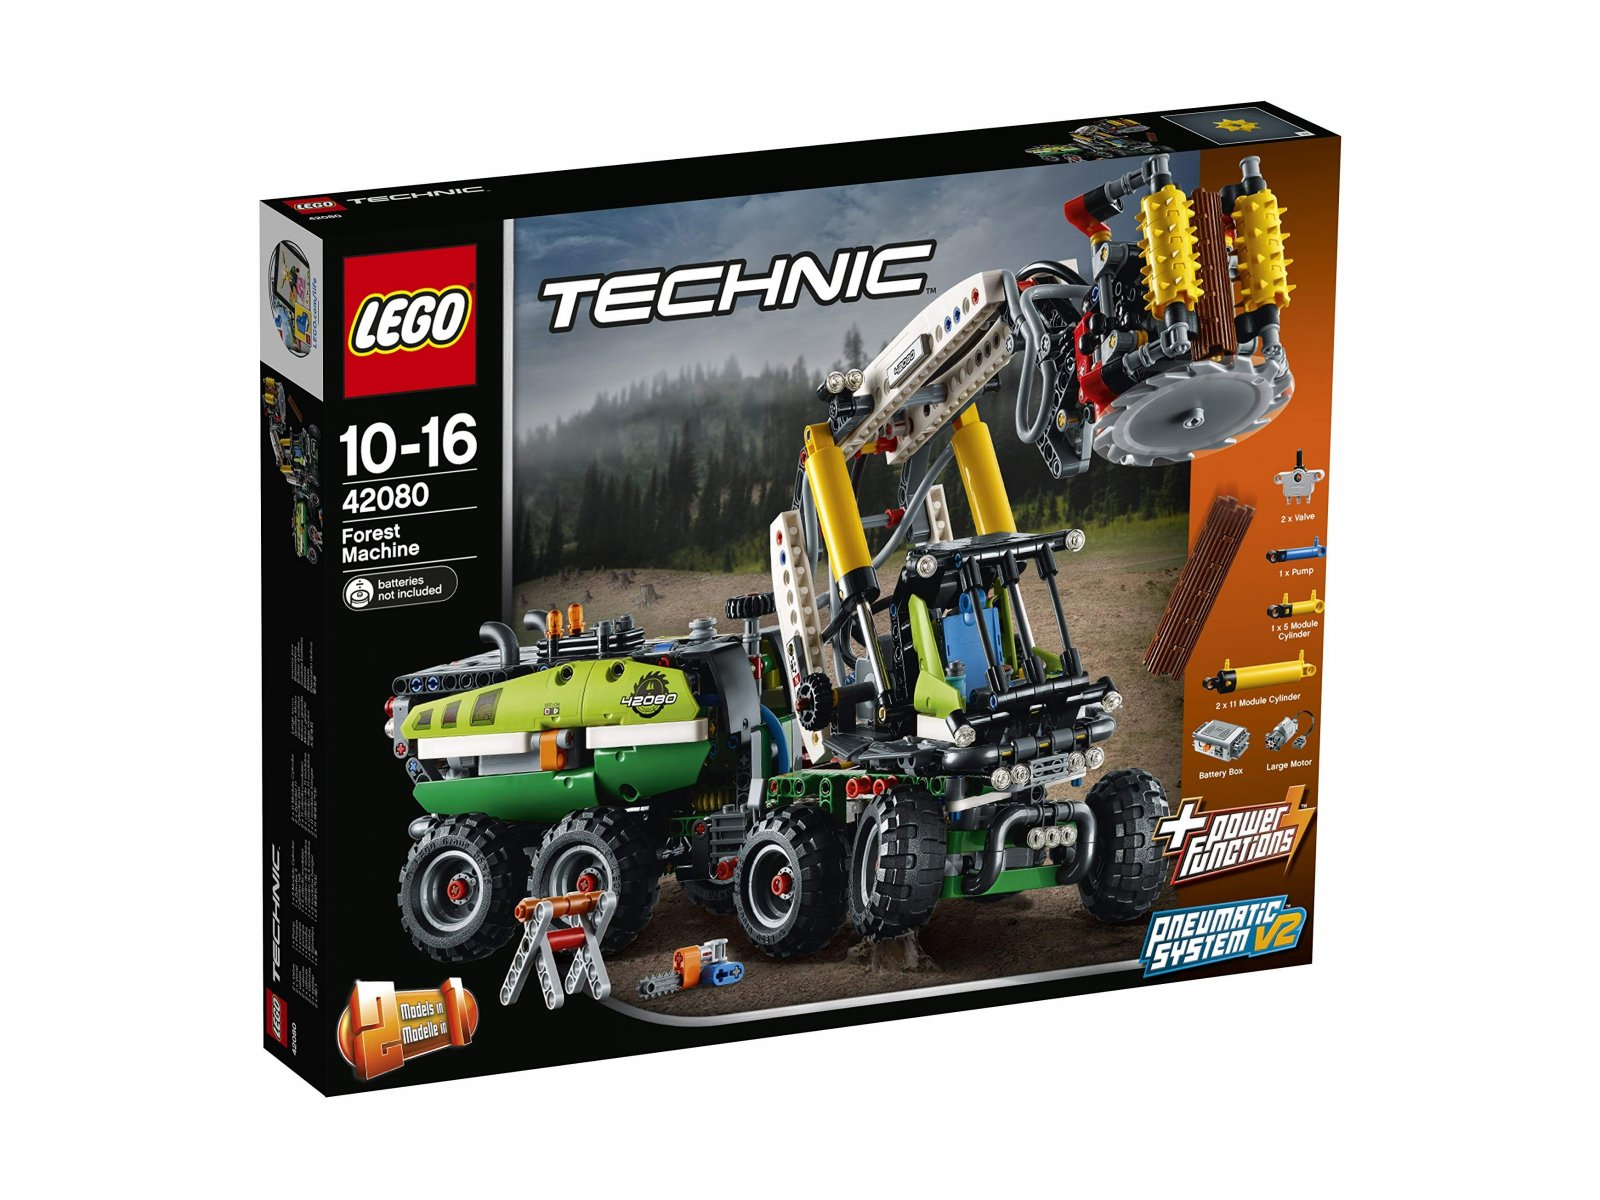 LEGO 42080 Technic Maszyna leśna